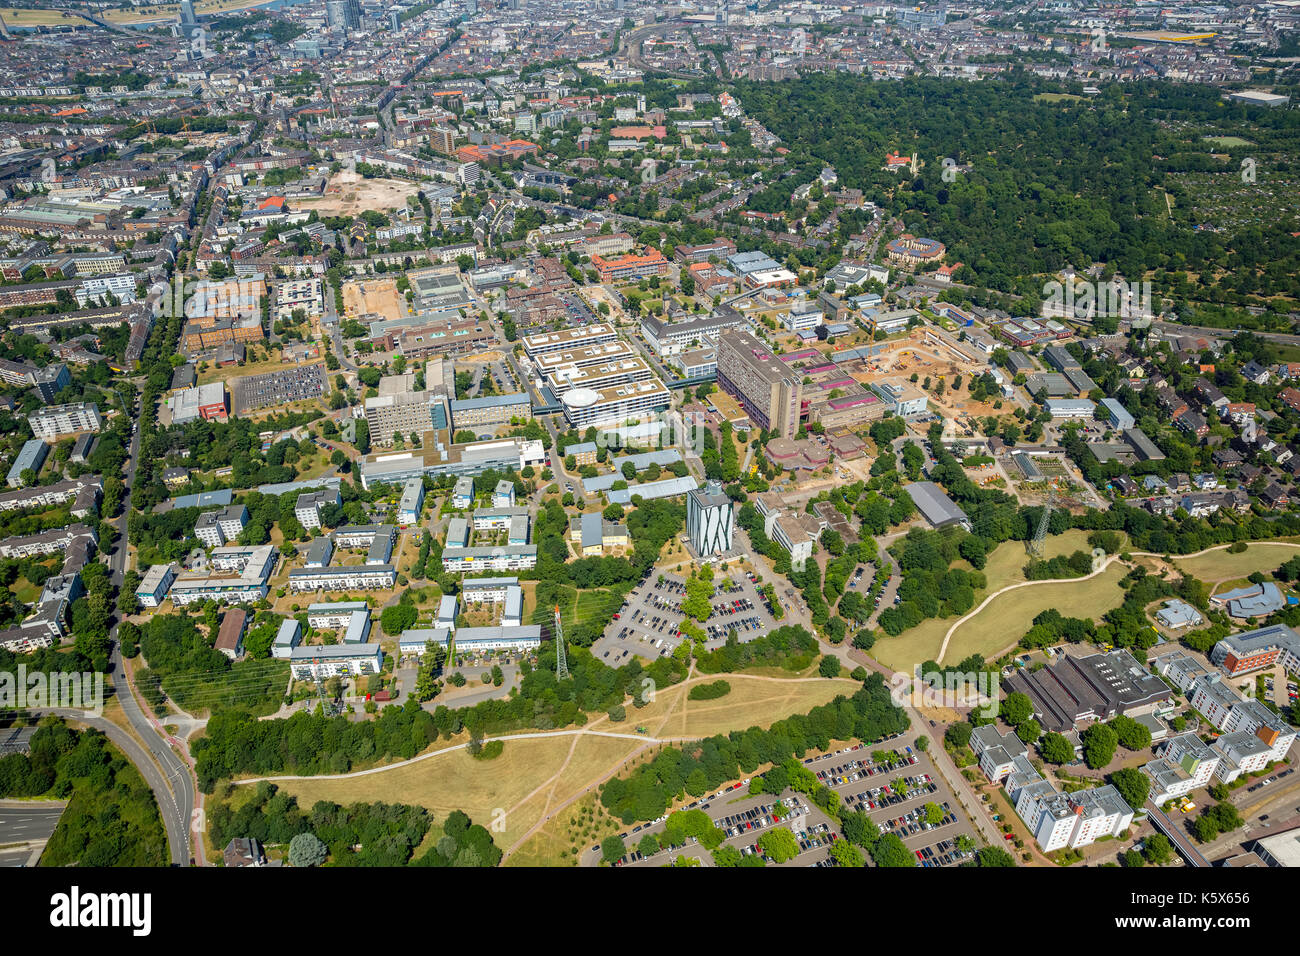 University Hospital of Dusseldorf, UKD - Department of Gastroenterology, Hepatology and Infectious Diseases, Dusseldorf, Rhineland, North Rhine-Westph - Stock Image